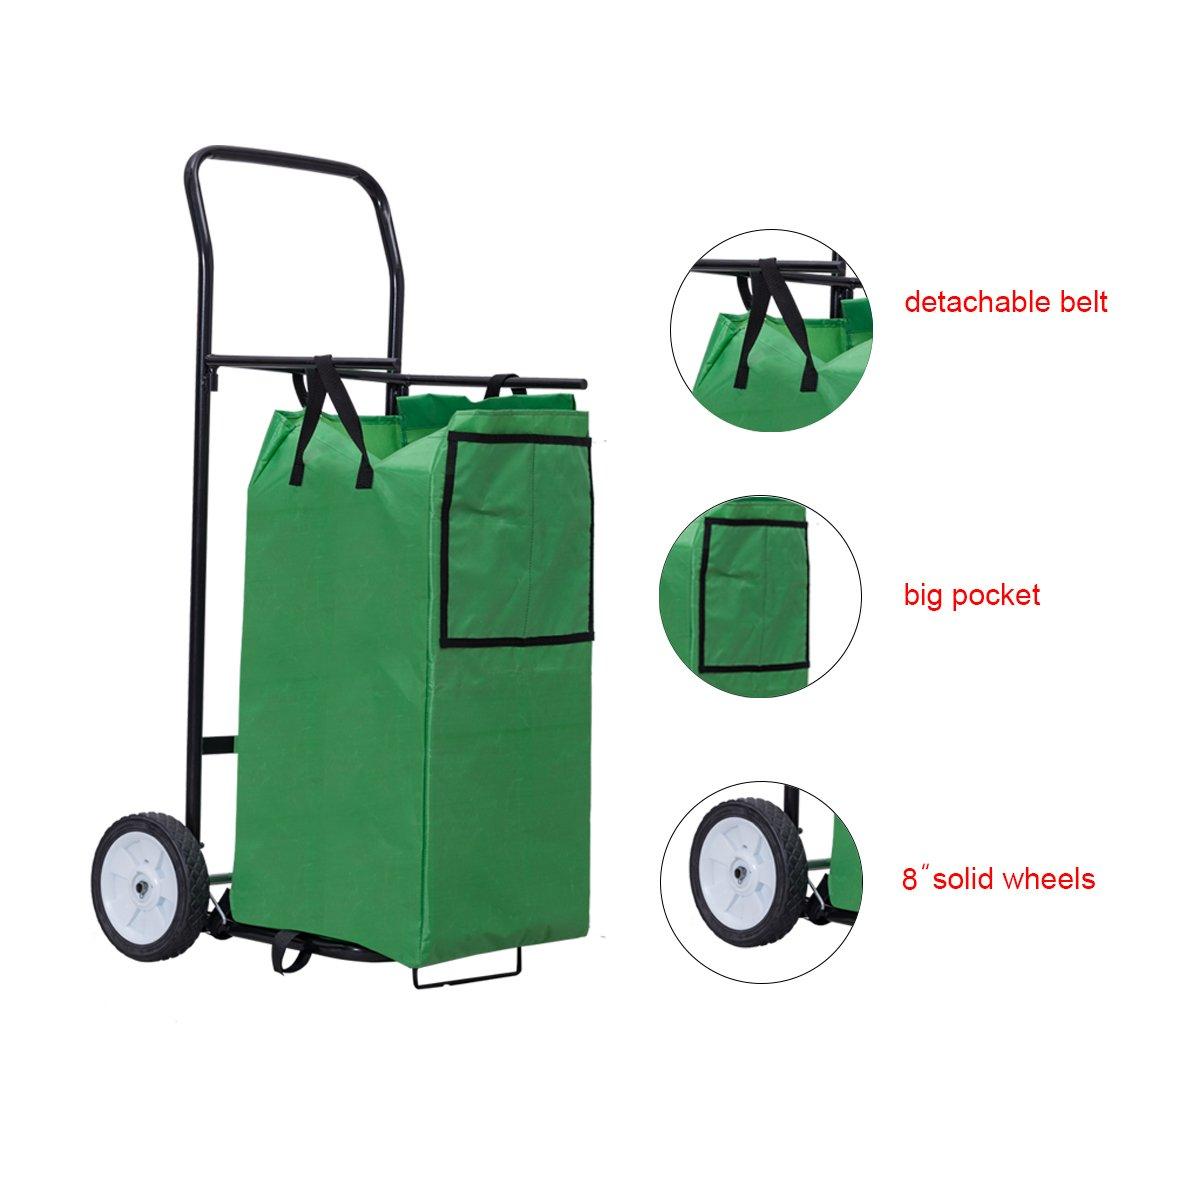 Goplus Portable Gardening Lawn Leaf Bag Detachable Tote Cart Multifunctional Folding Basket w/ Pocket Green by Goplus (Image #4)